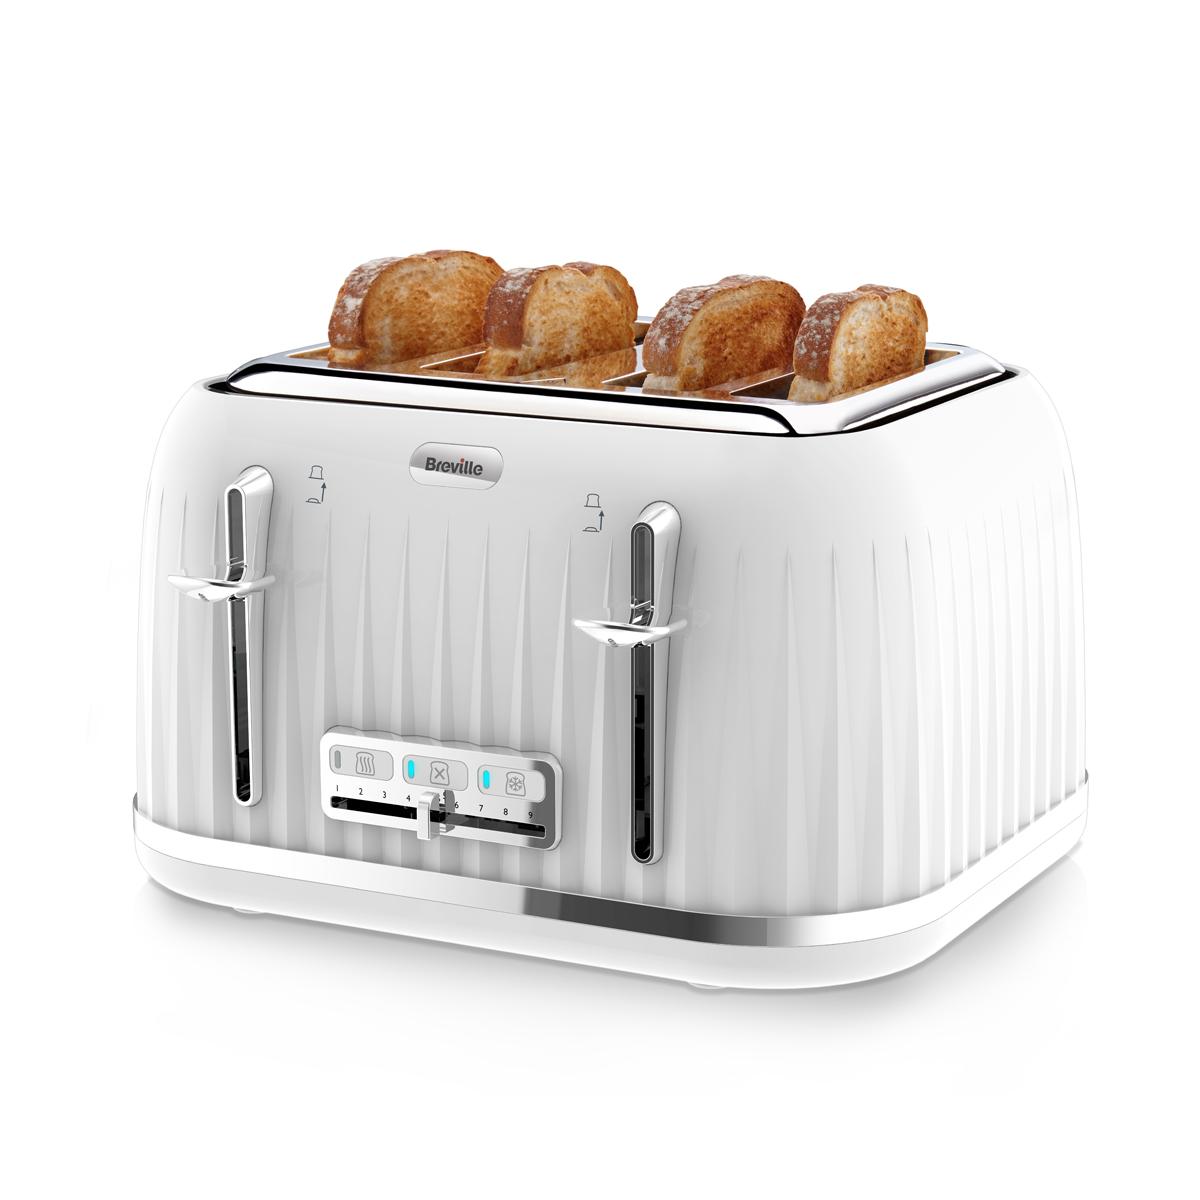 6851a219c405 Impressions 4 Slice Toaster VTT634-01 | Breville